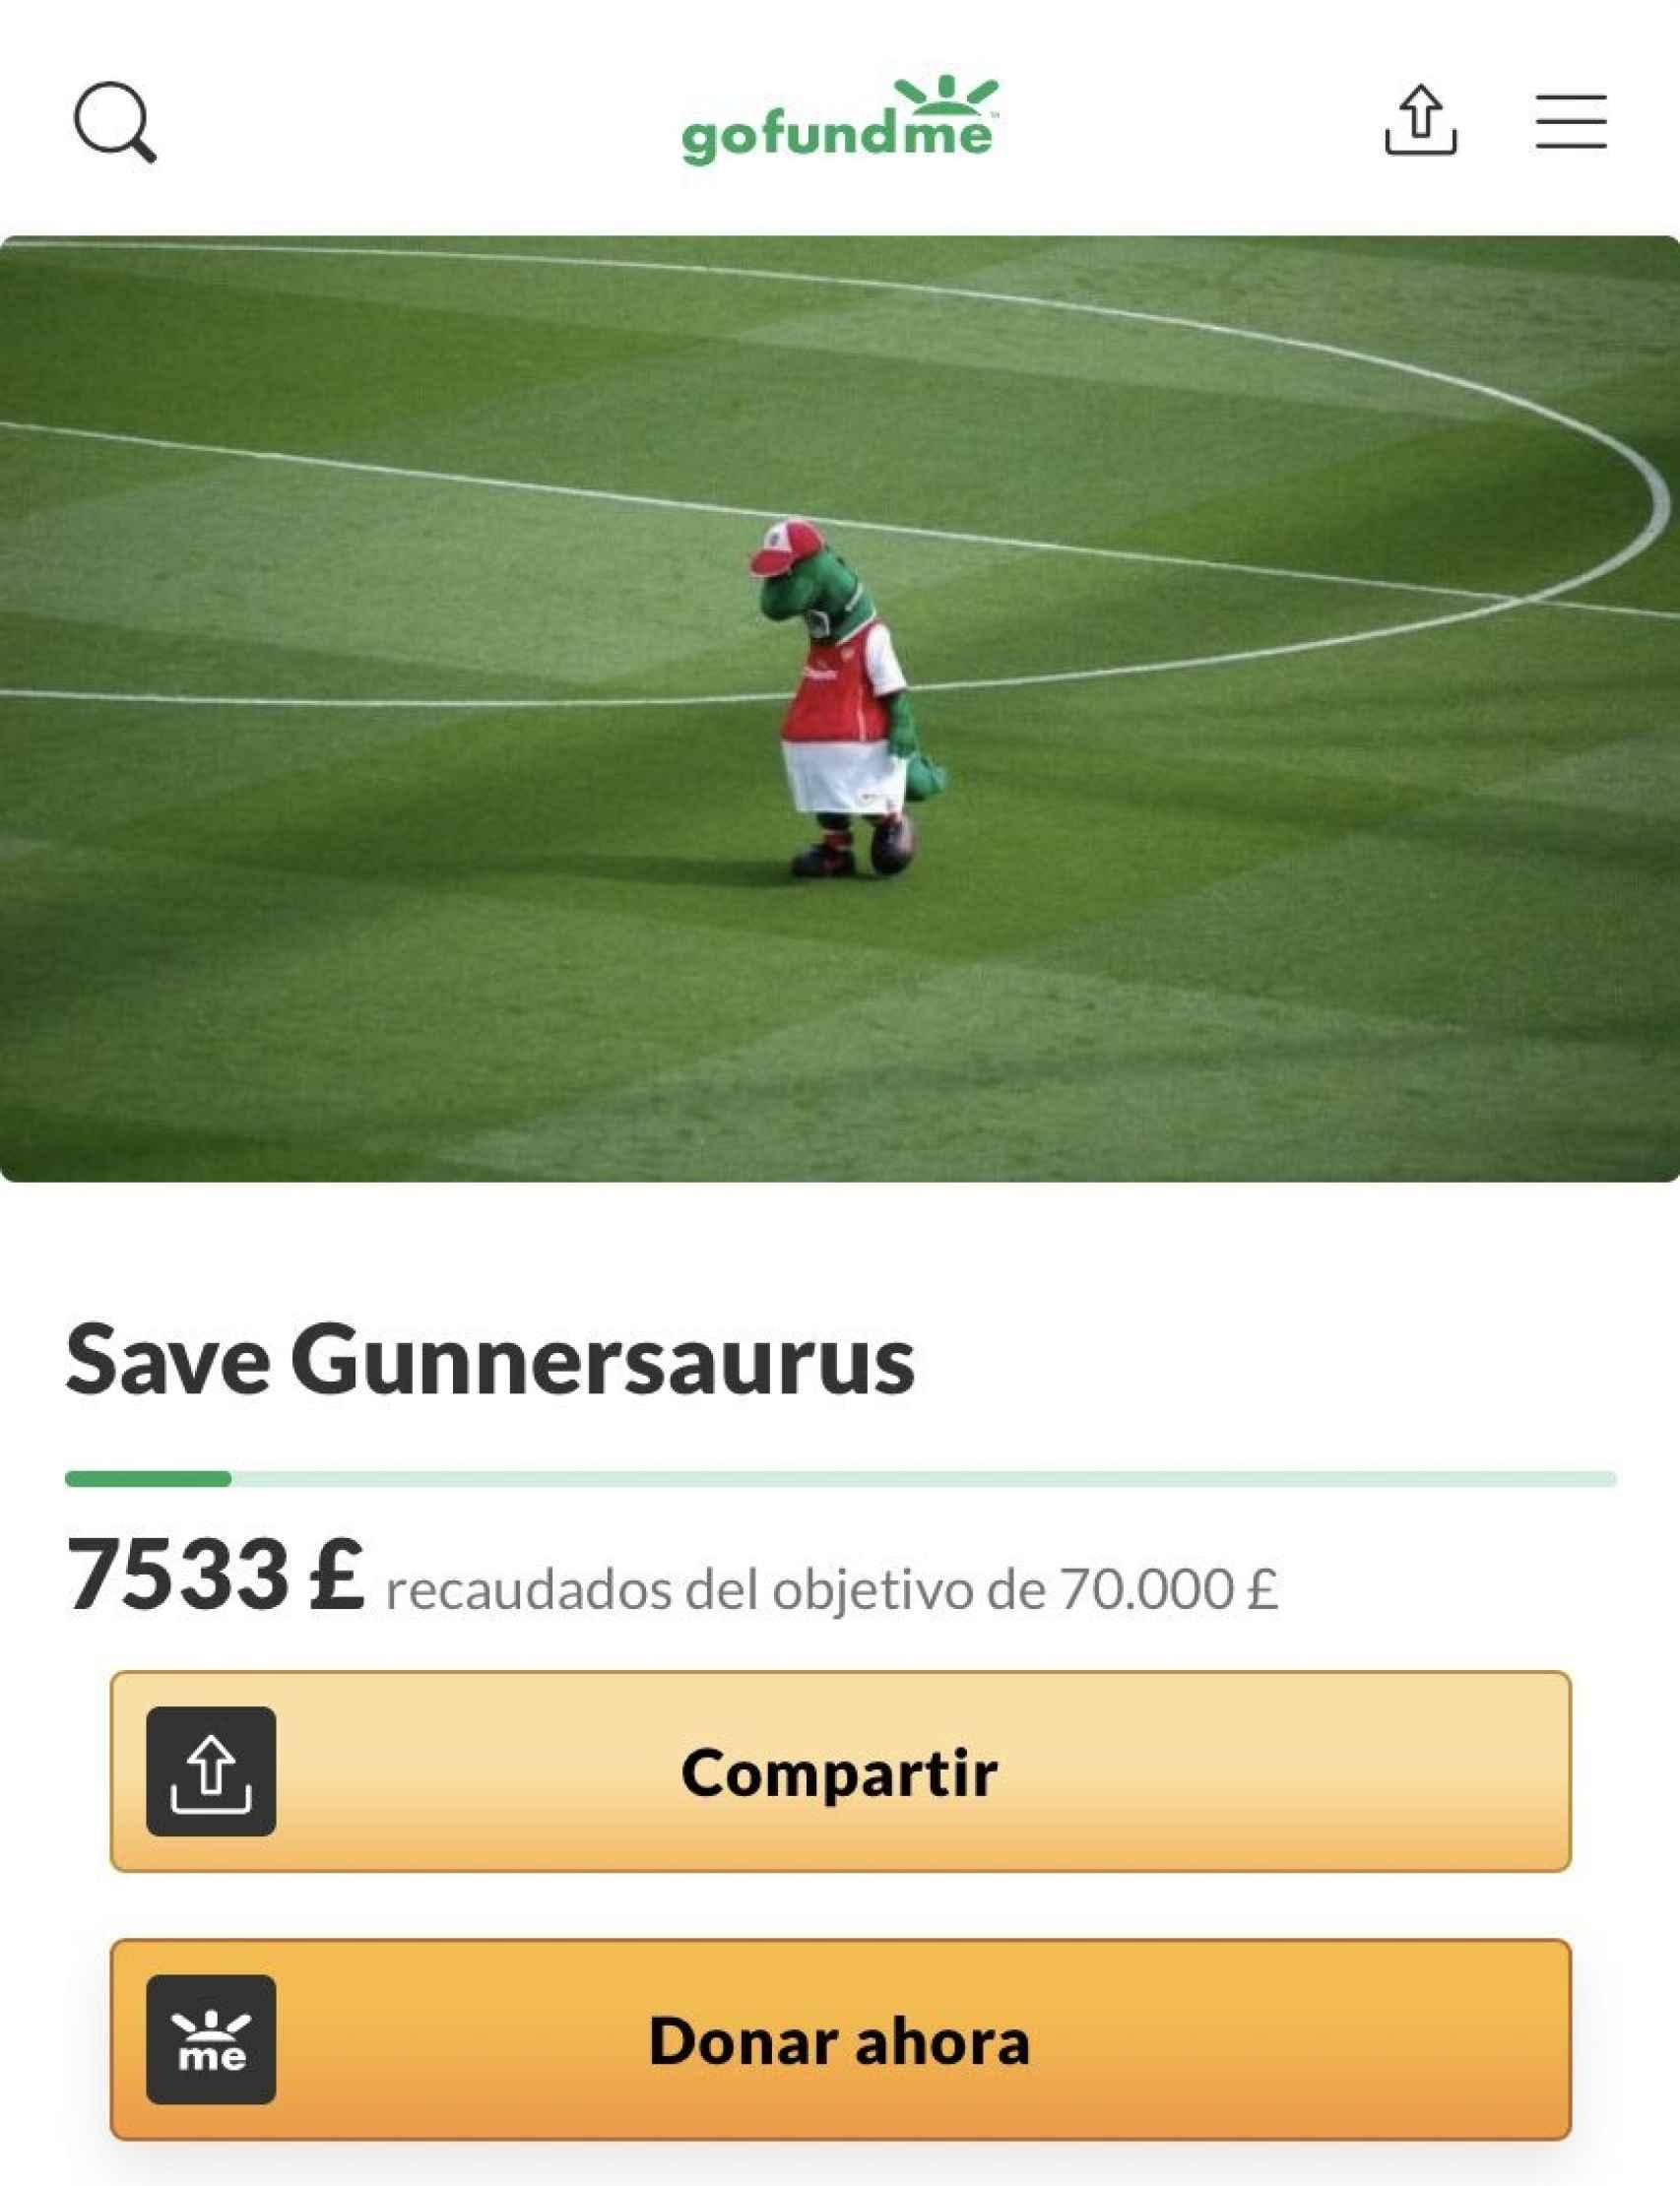 El crowdfounding para rescatar a Gunnersaurus